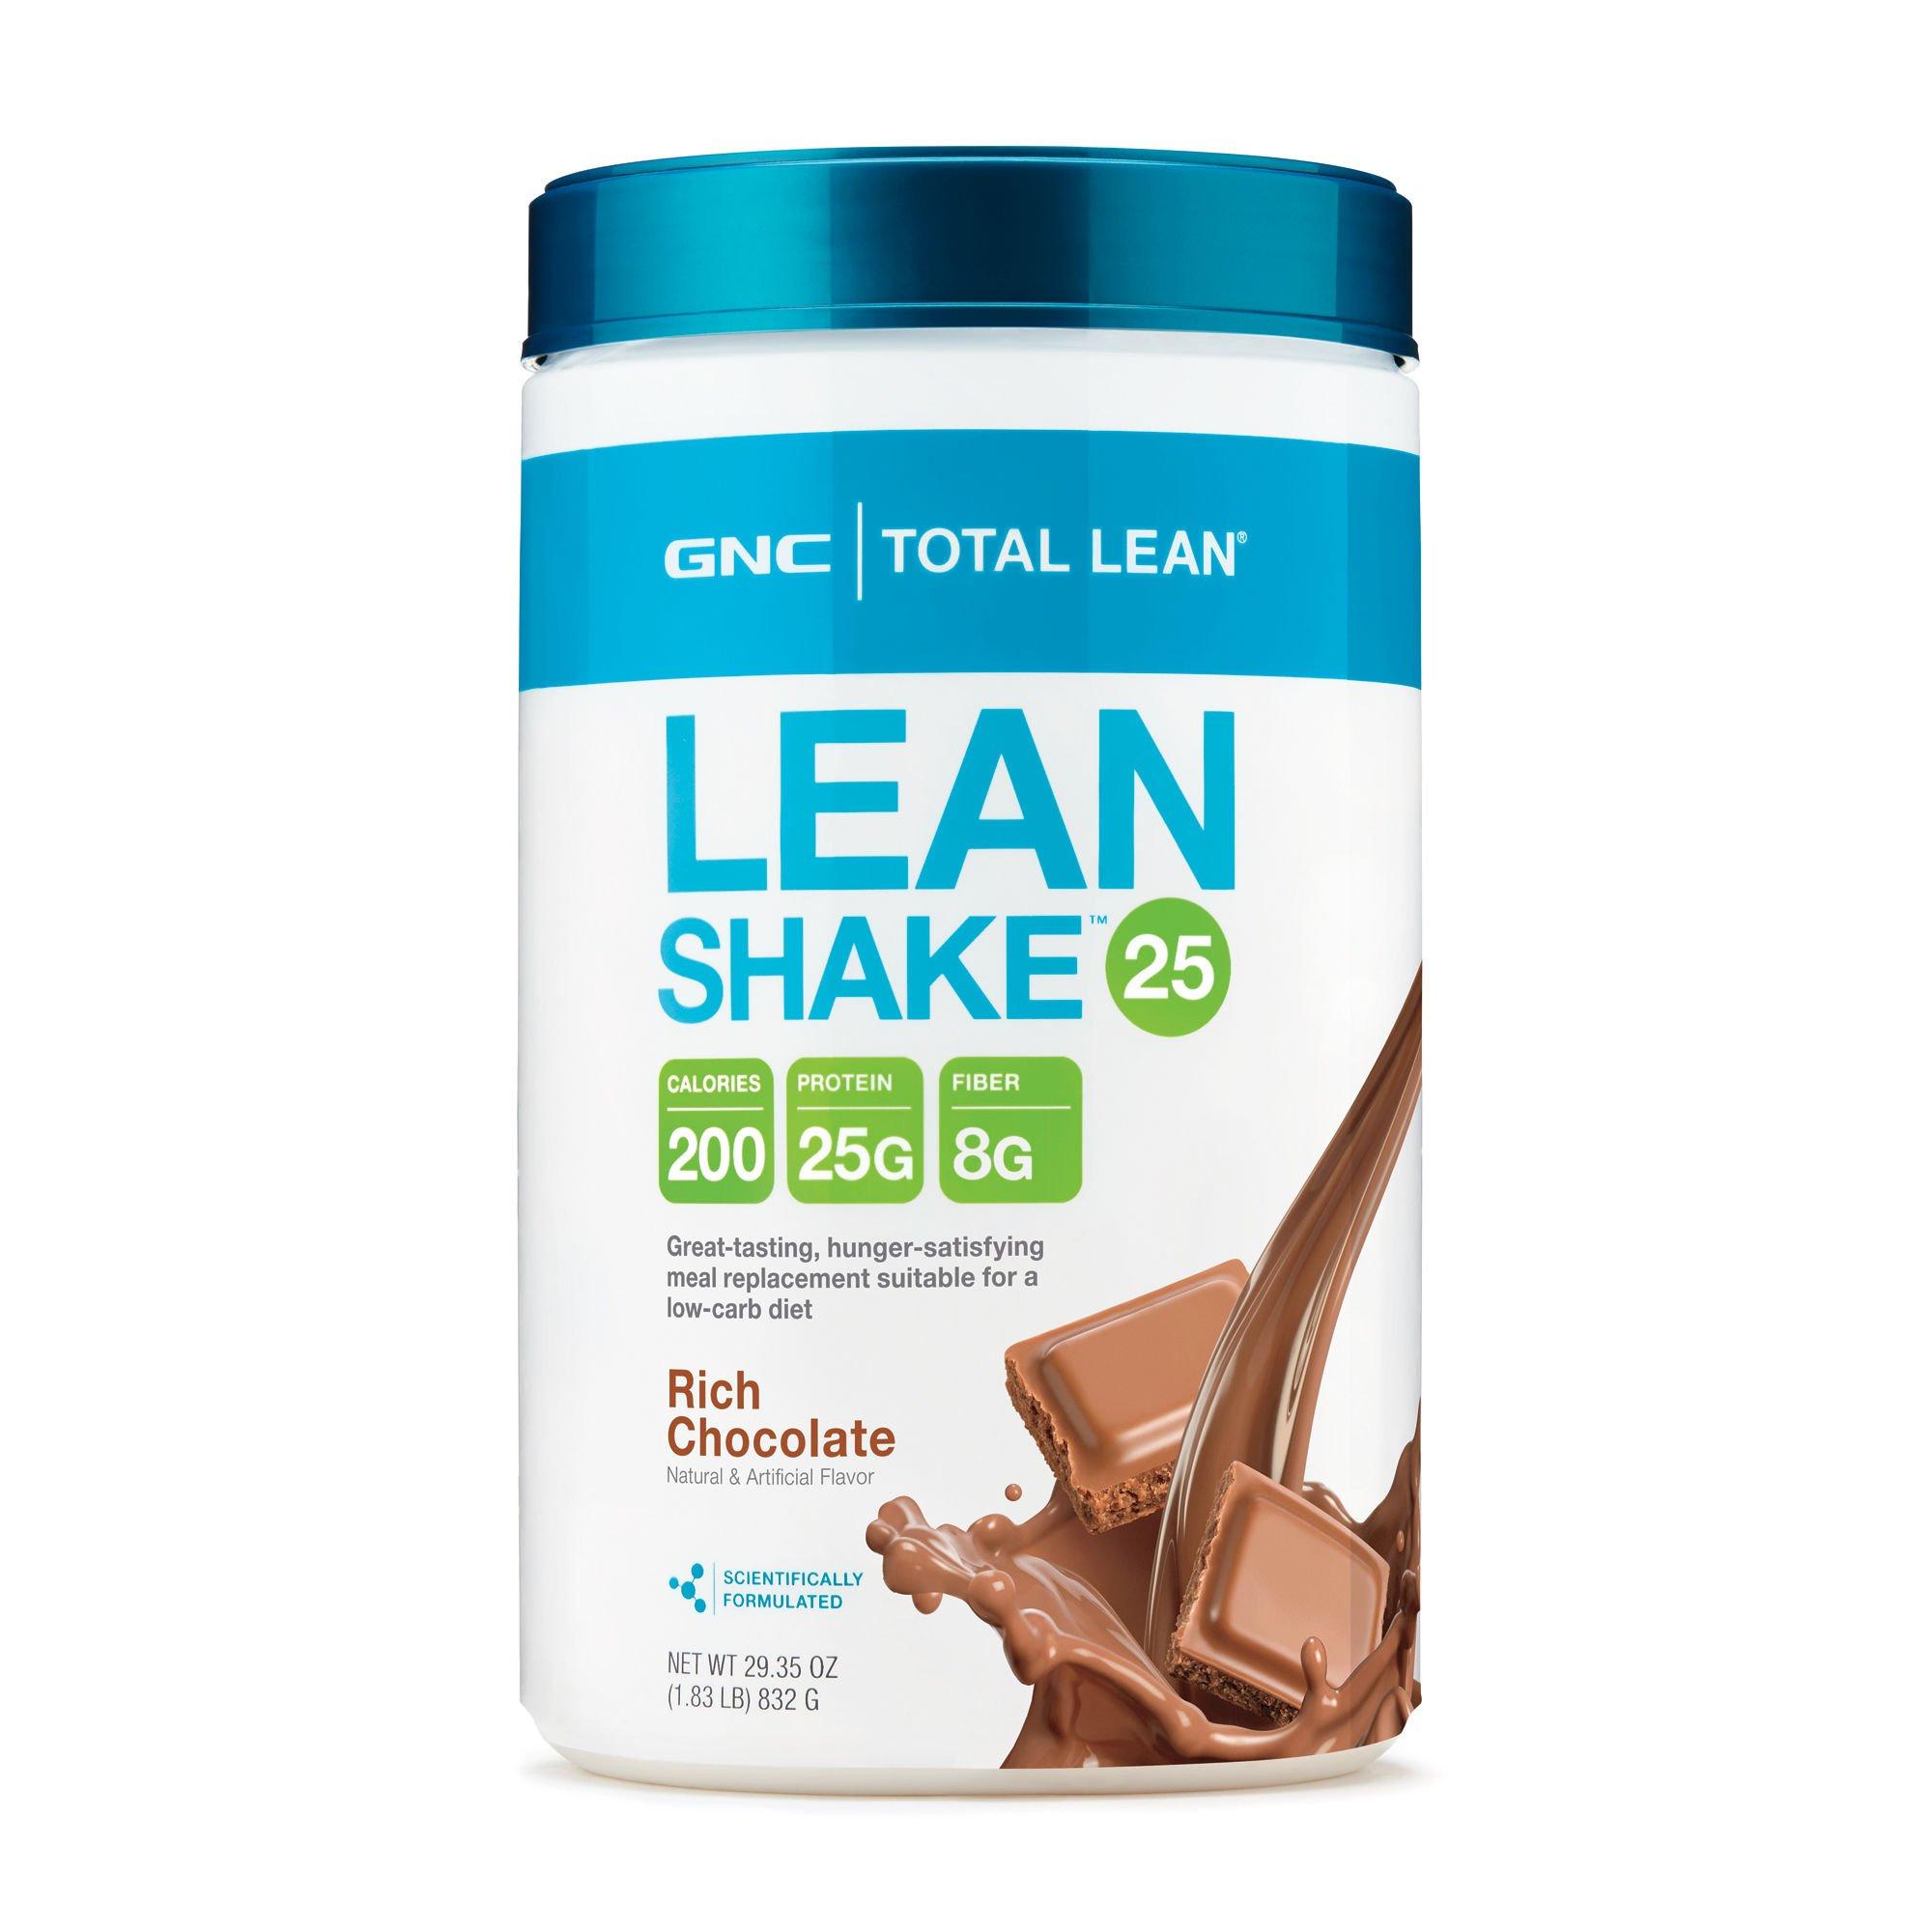 GNC Total Lean Lean Shake 25 - Rich Chocolate Bundle